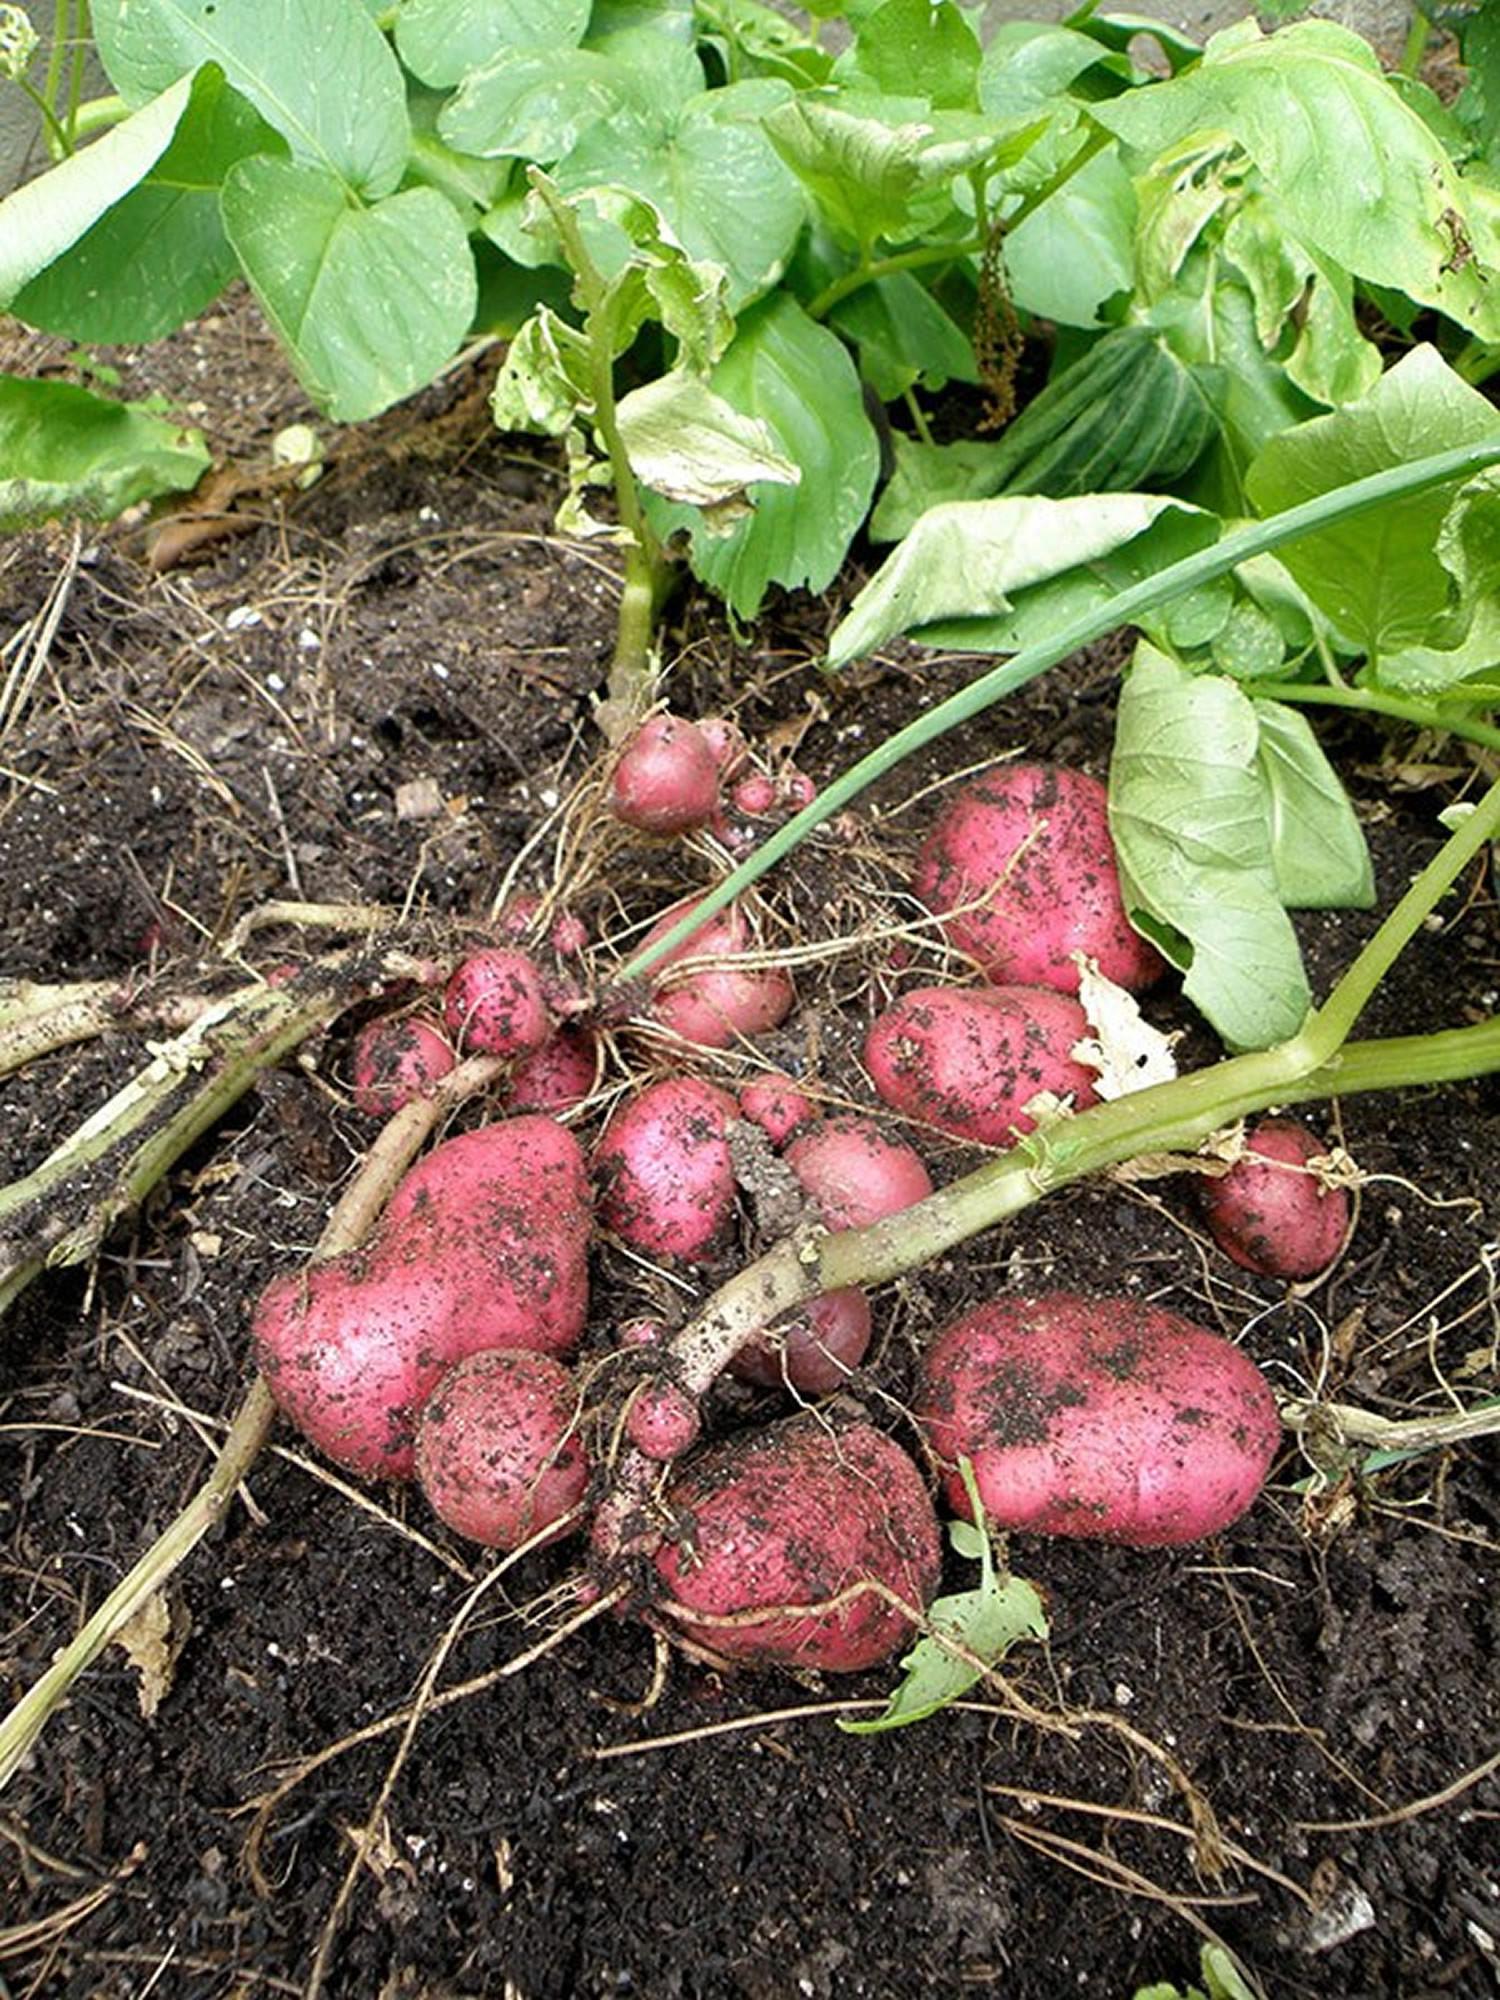 What Is A Potato  Potato Nutrition Facts Calories Fiber Fat Carbs and